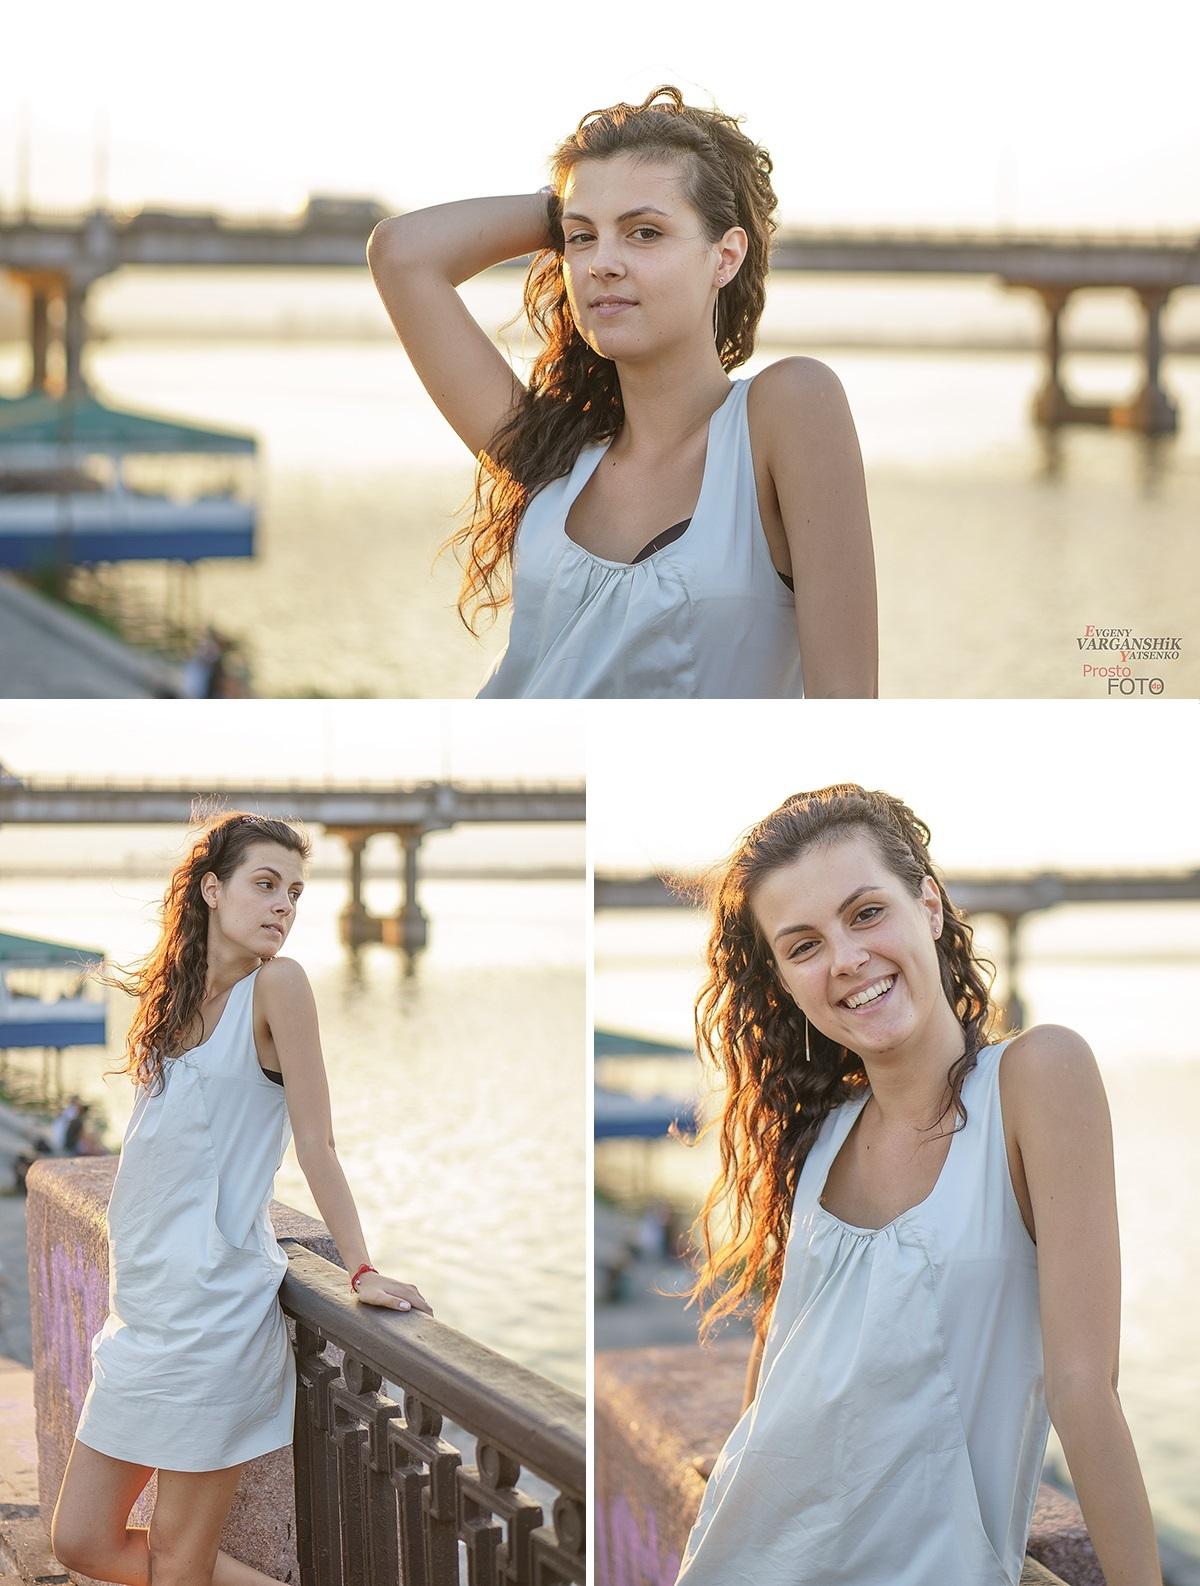 Прогулка по набережной: Марина